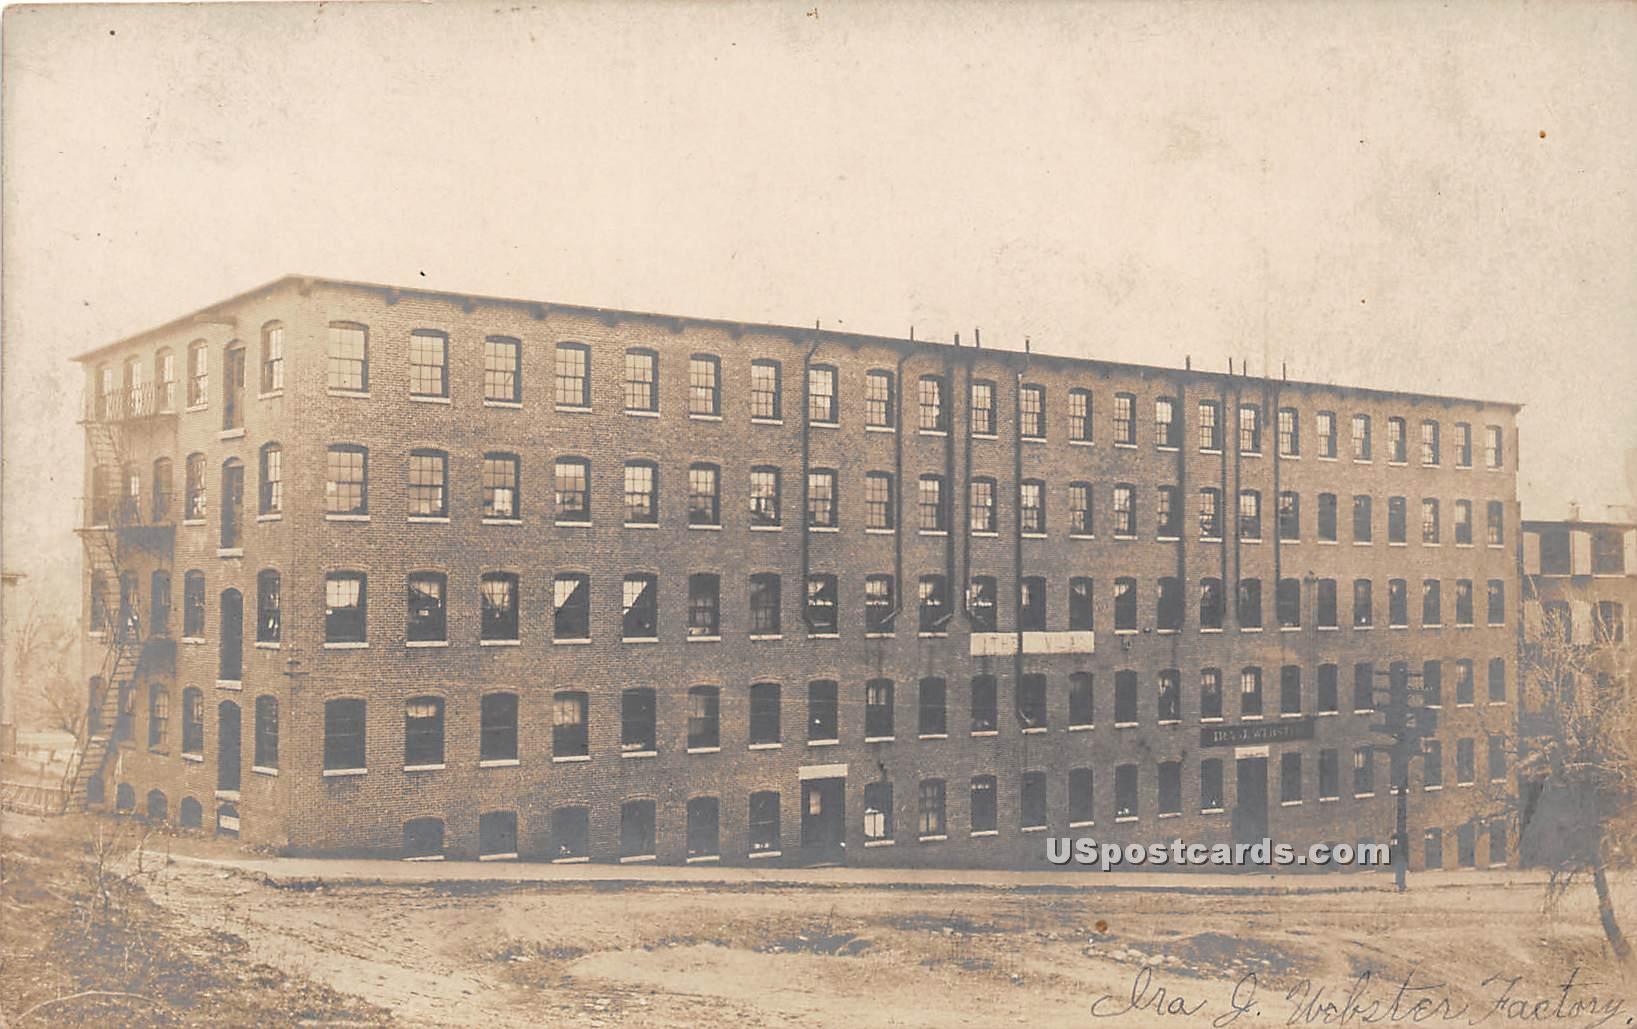 Ira J Webster Factory - Misc, Massachusetts MA Postcard